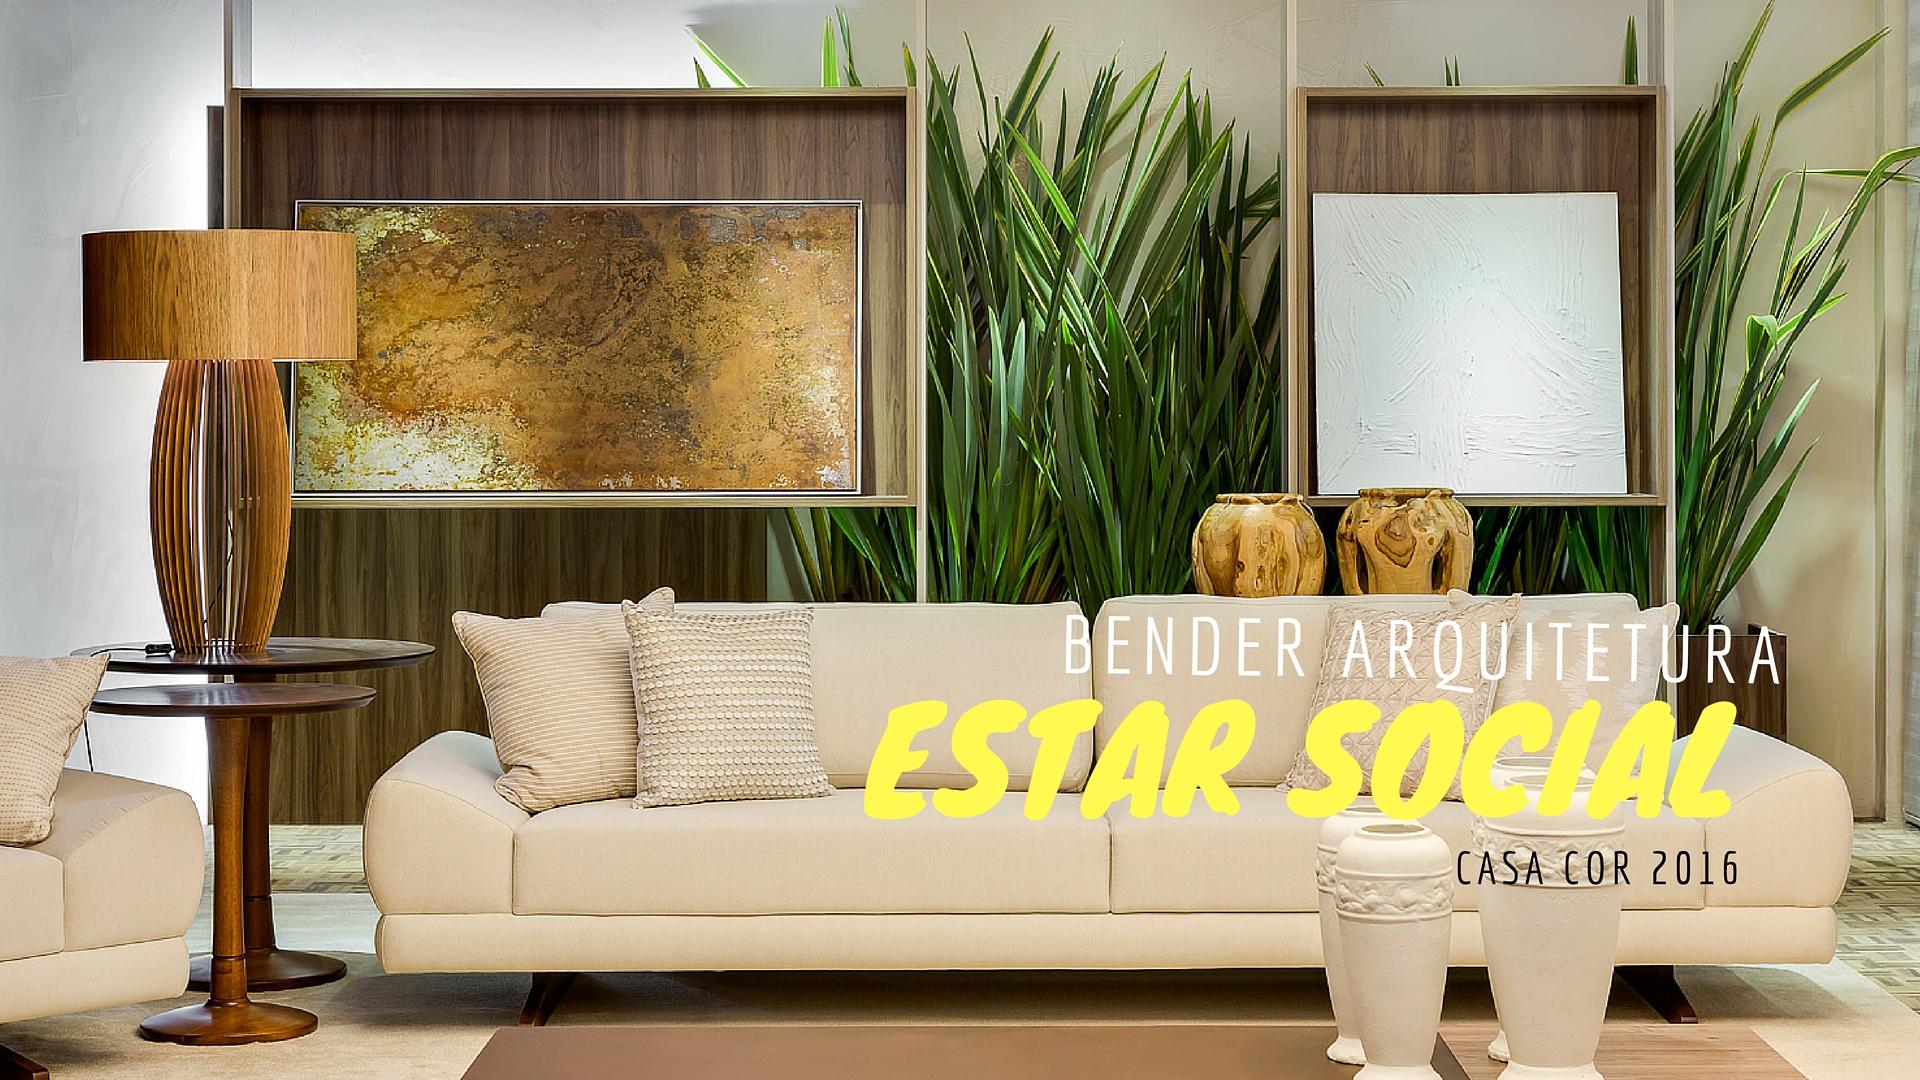 bender-arquitetura